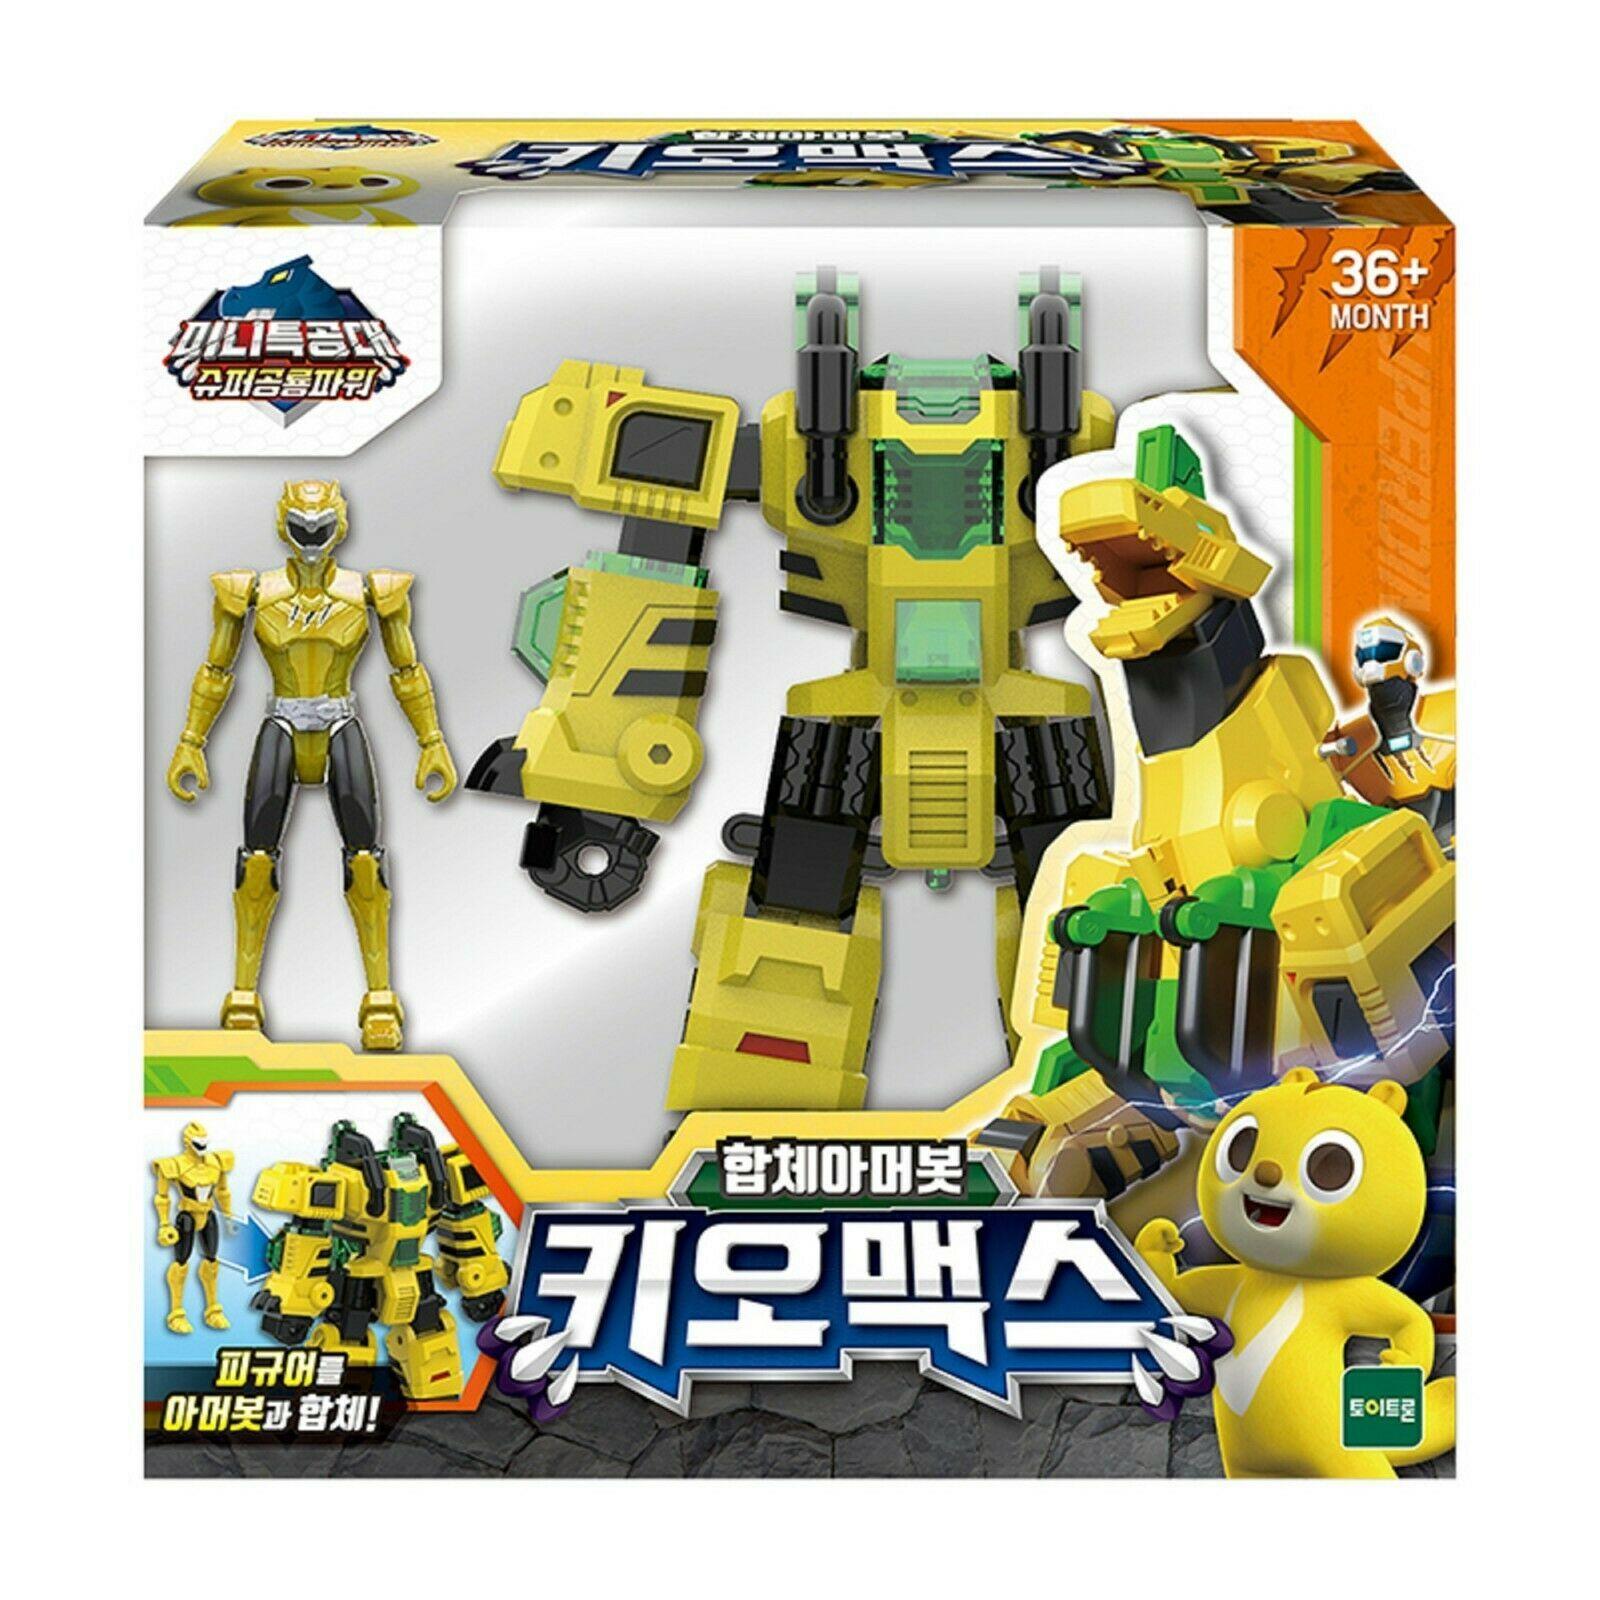 Miniforce Chio Max Transformation Action Figure Super Dinosaur Power Part 2 Toy